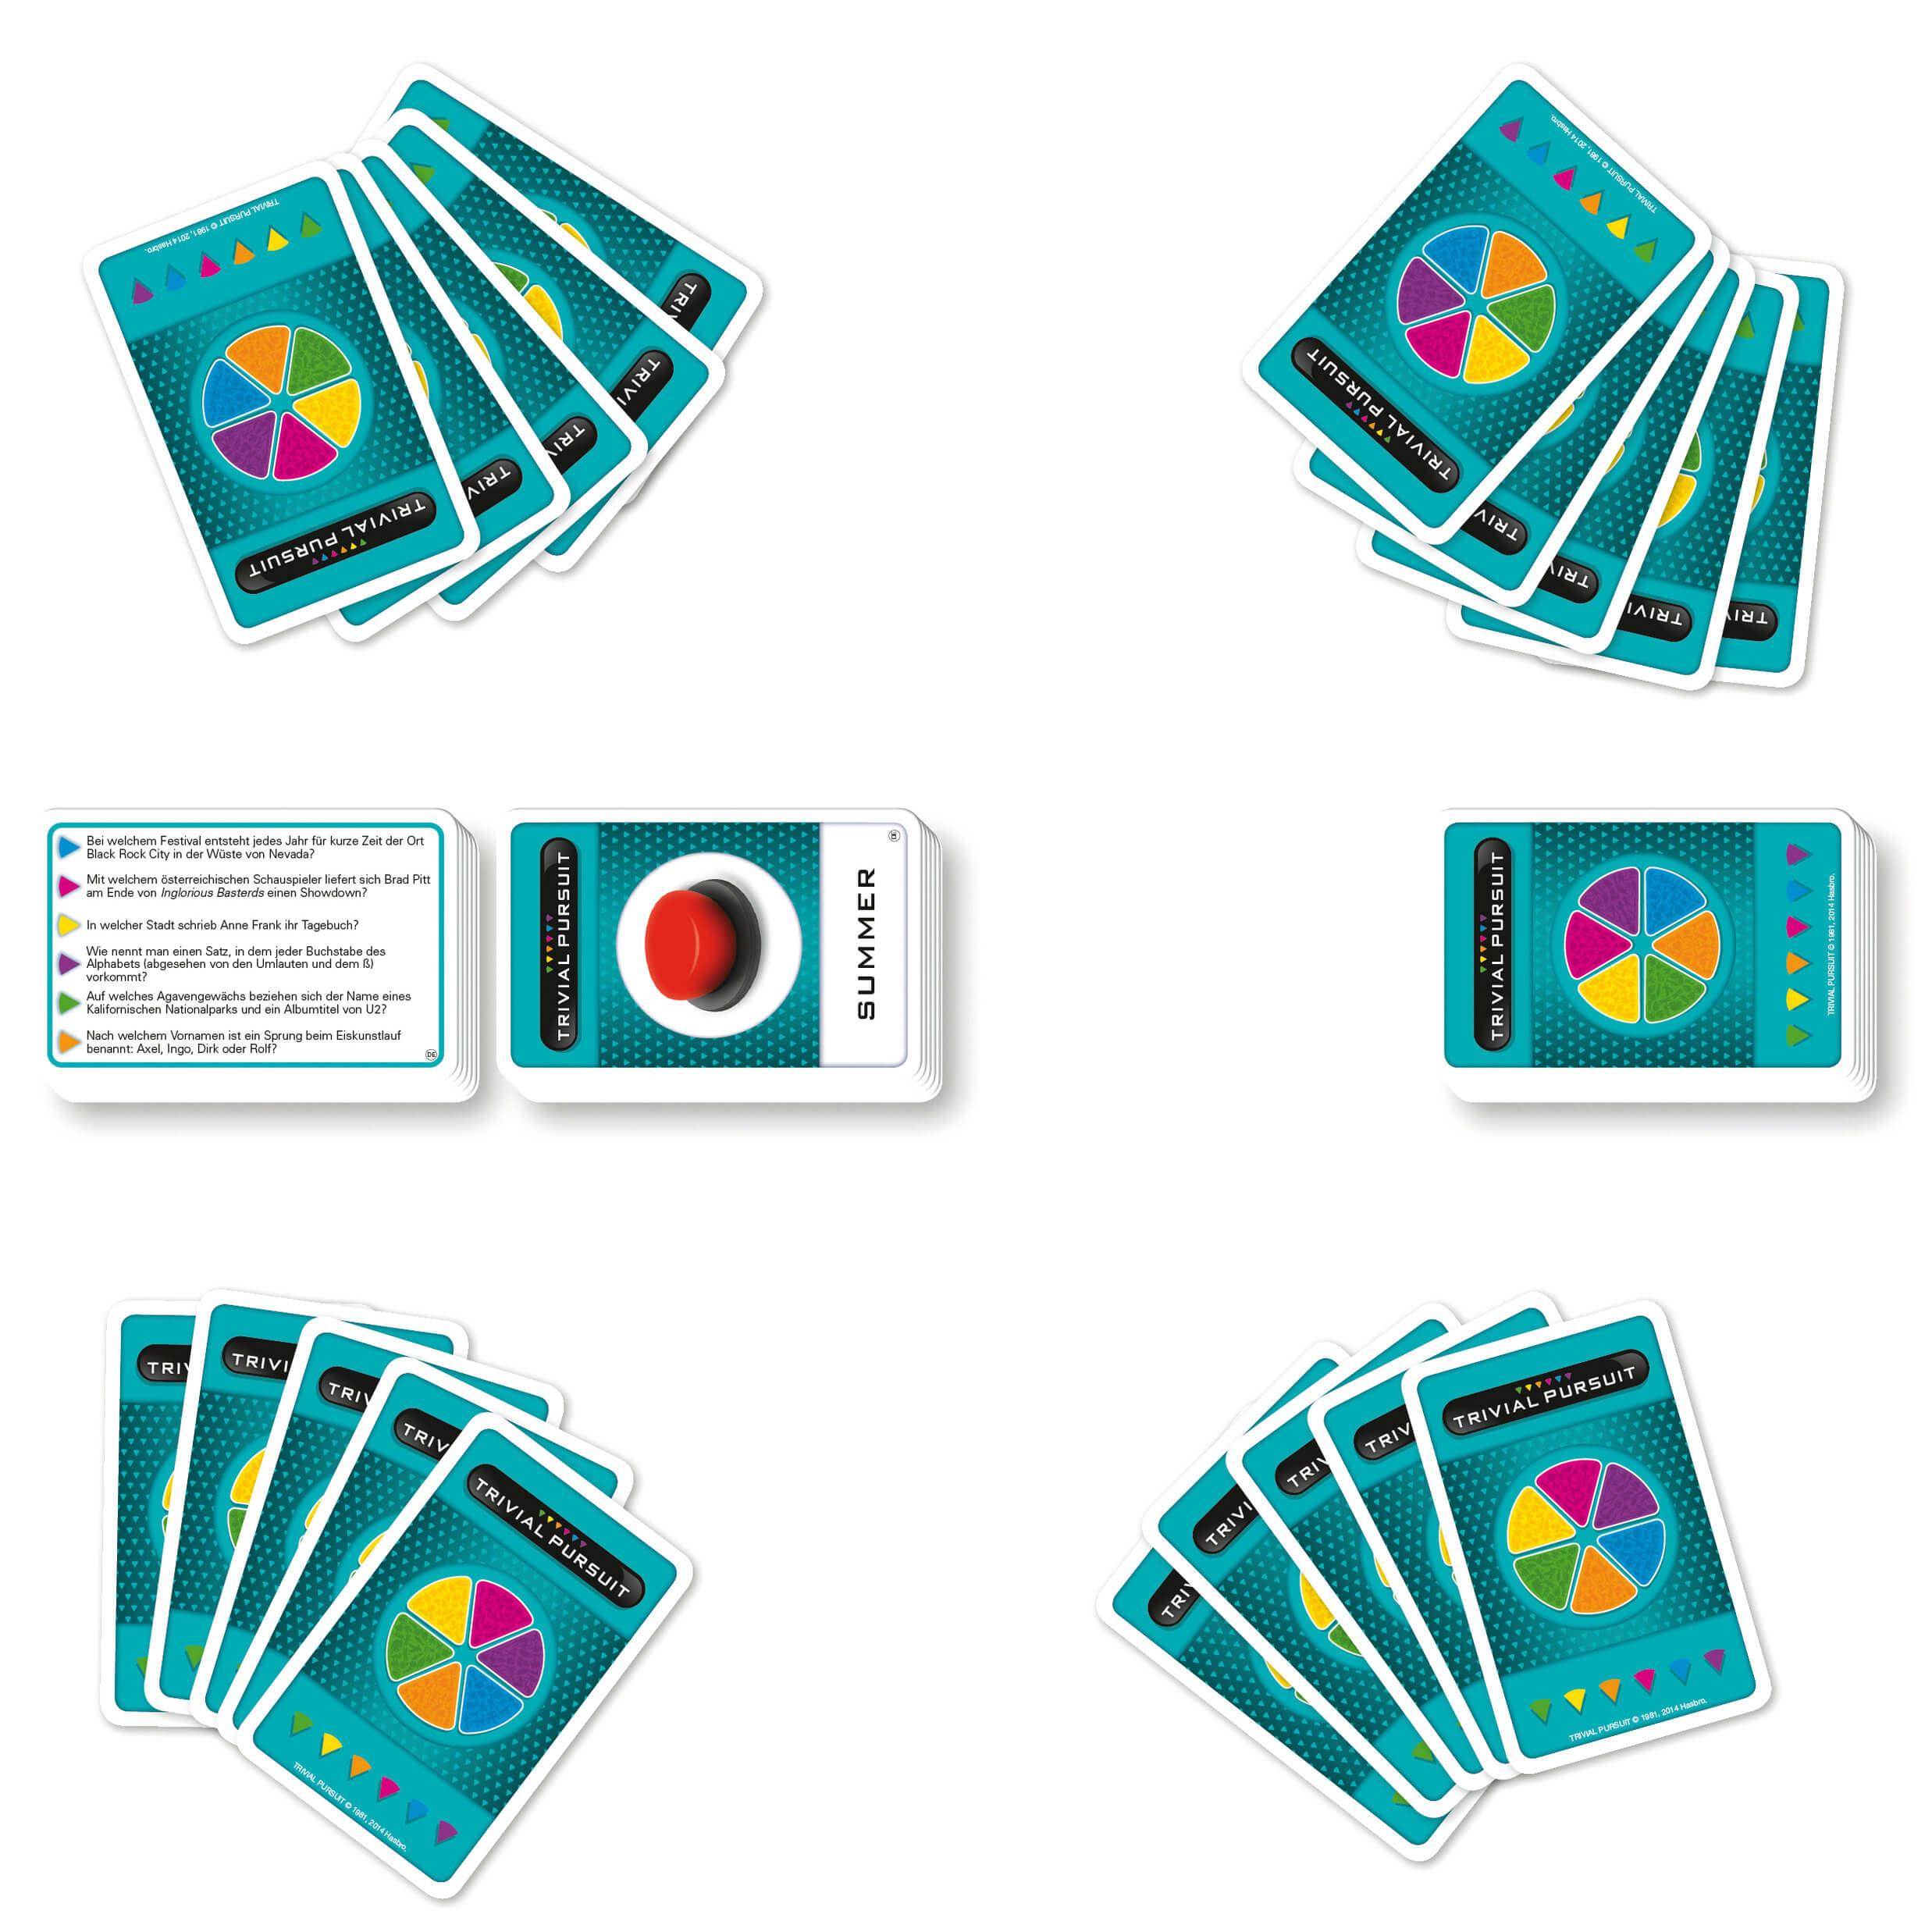 Kartenspiel Trivial Pursuit